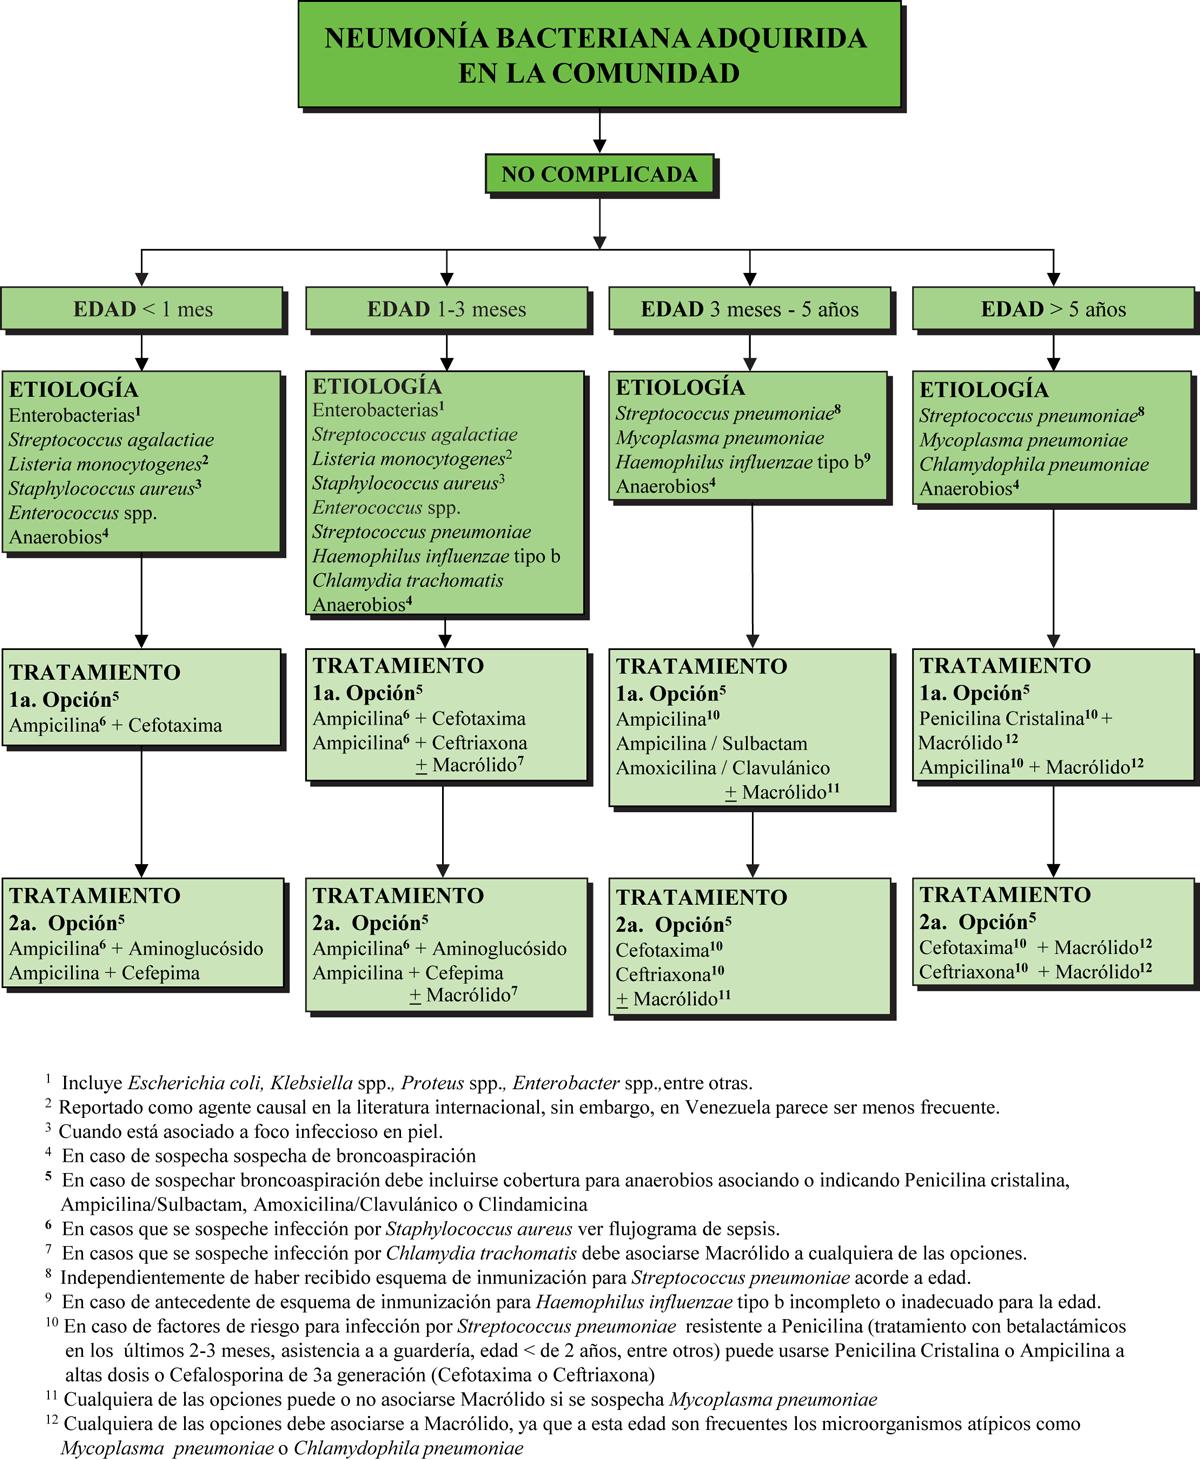 botica16-F1